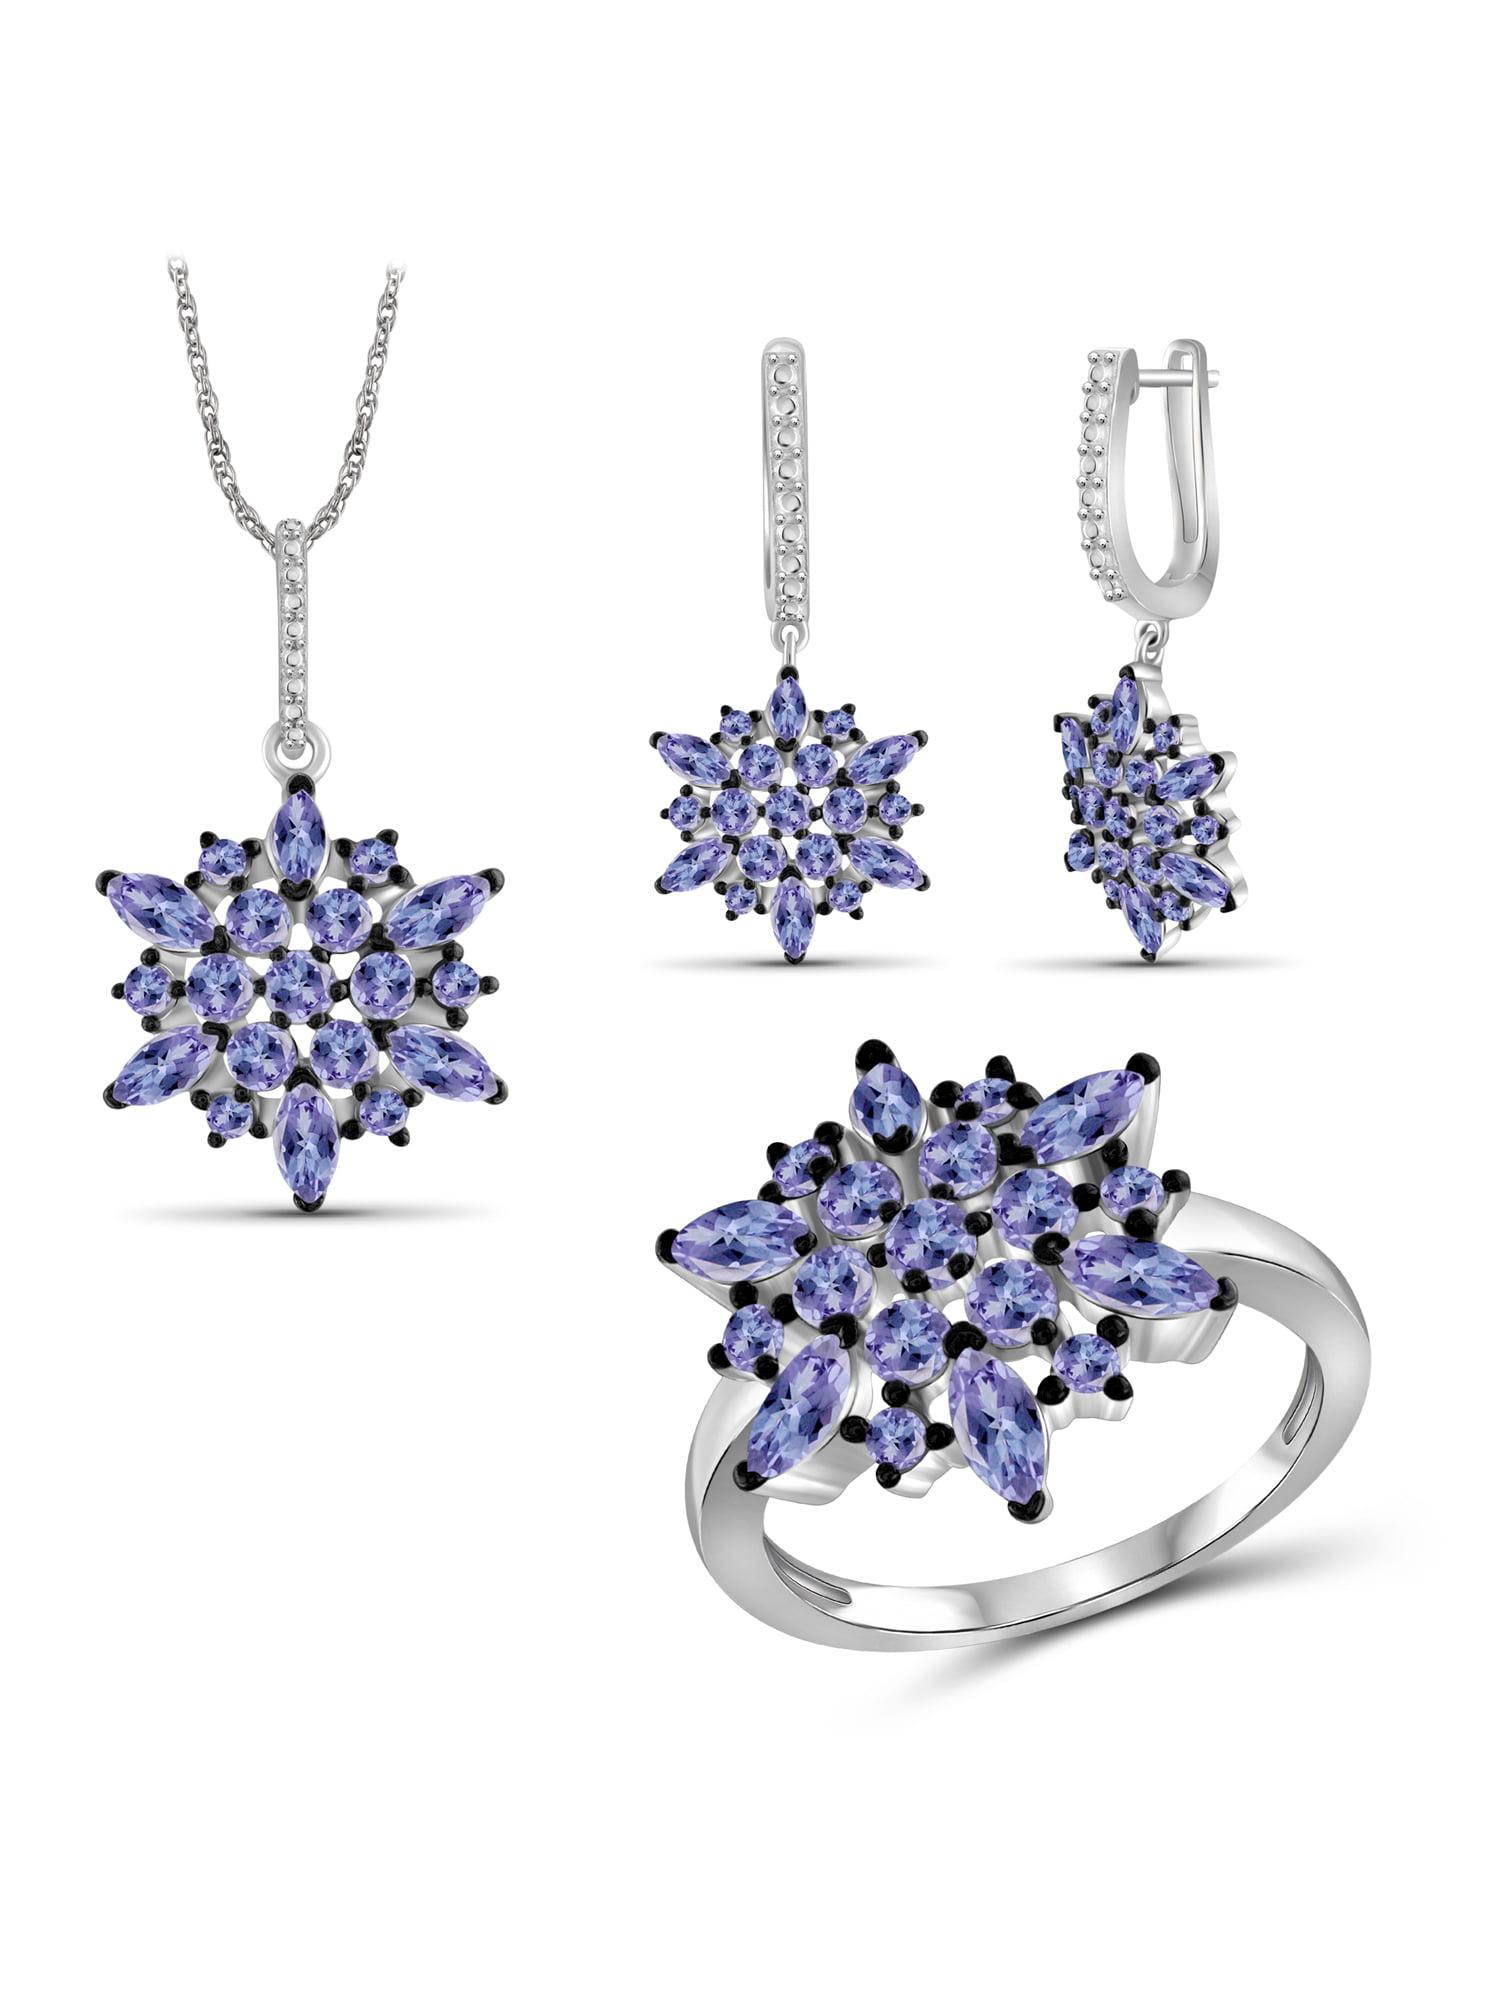 JewelersClub 6 1 4 Carat T.G.W. Tanzanite Sterling Silver 3-Piece Jewelry set by JewelersClub